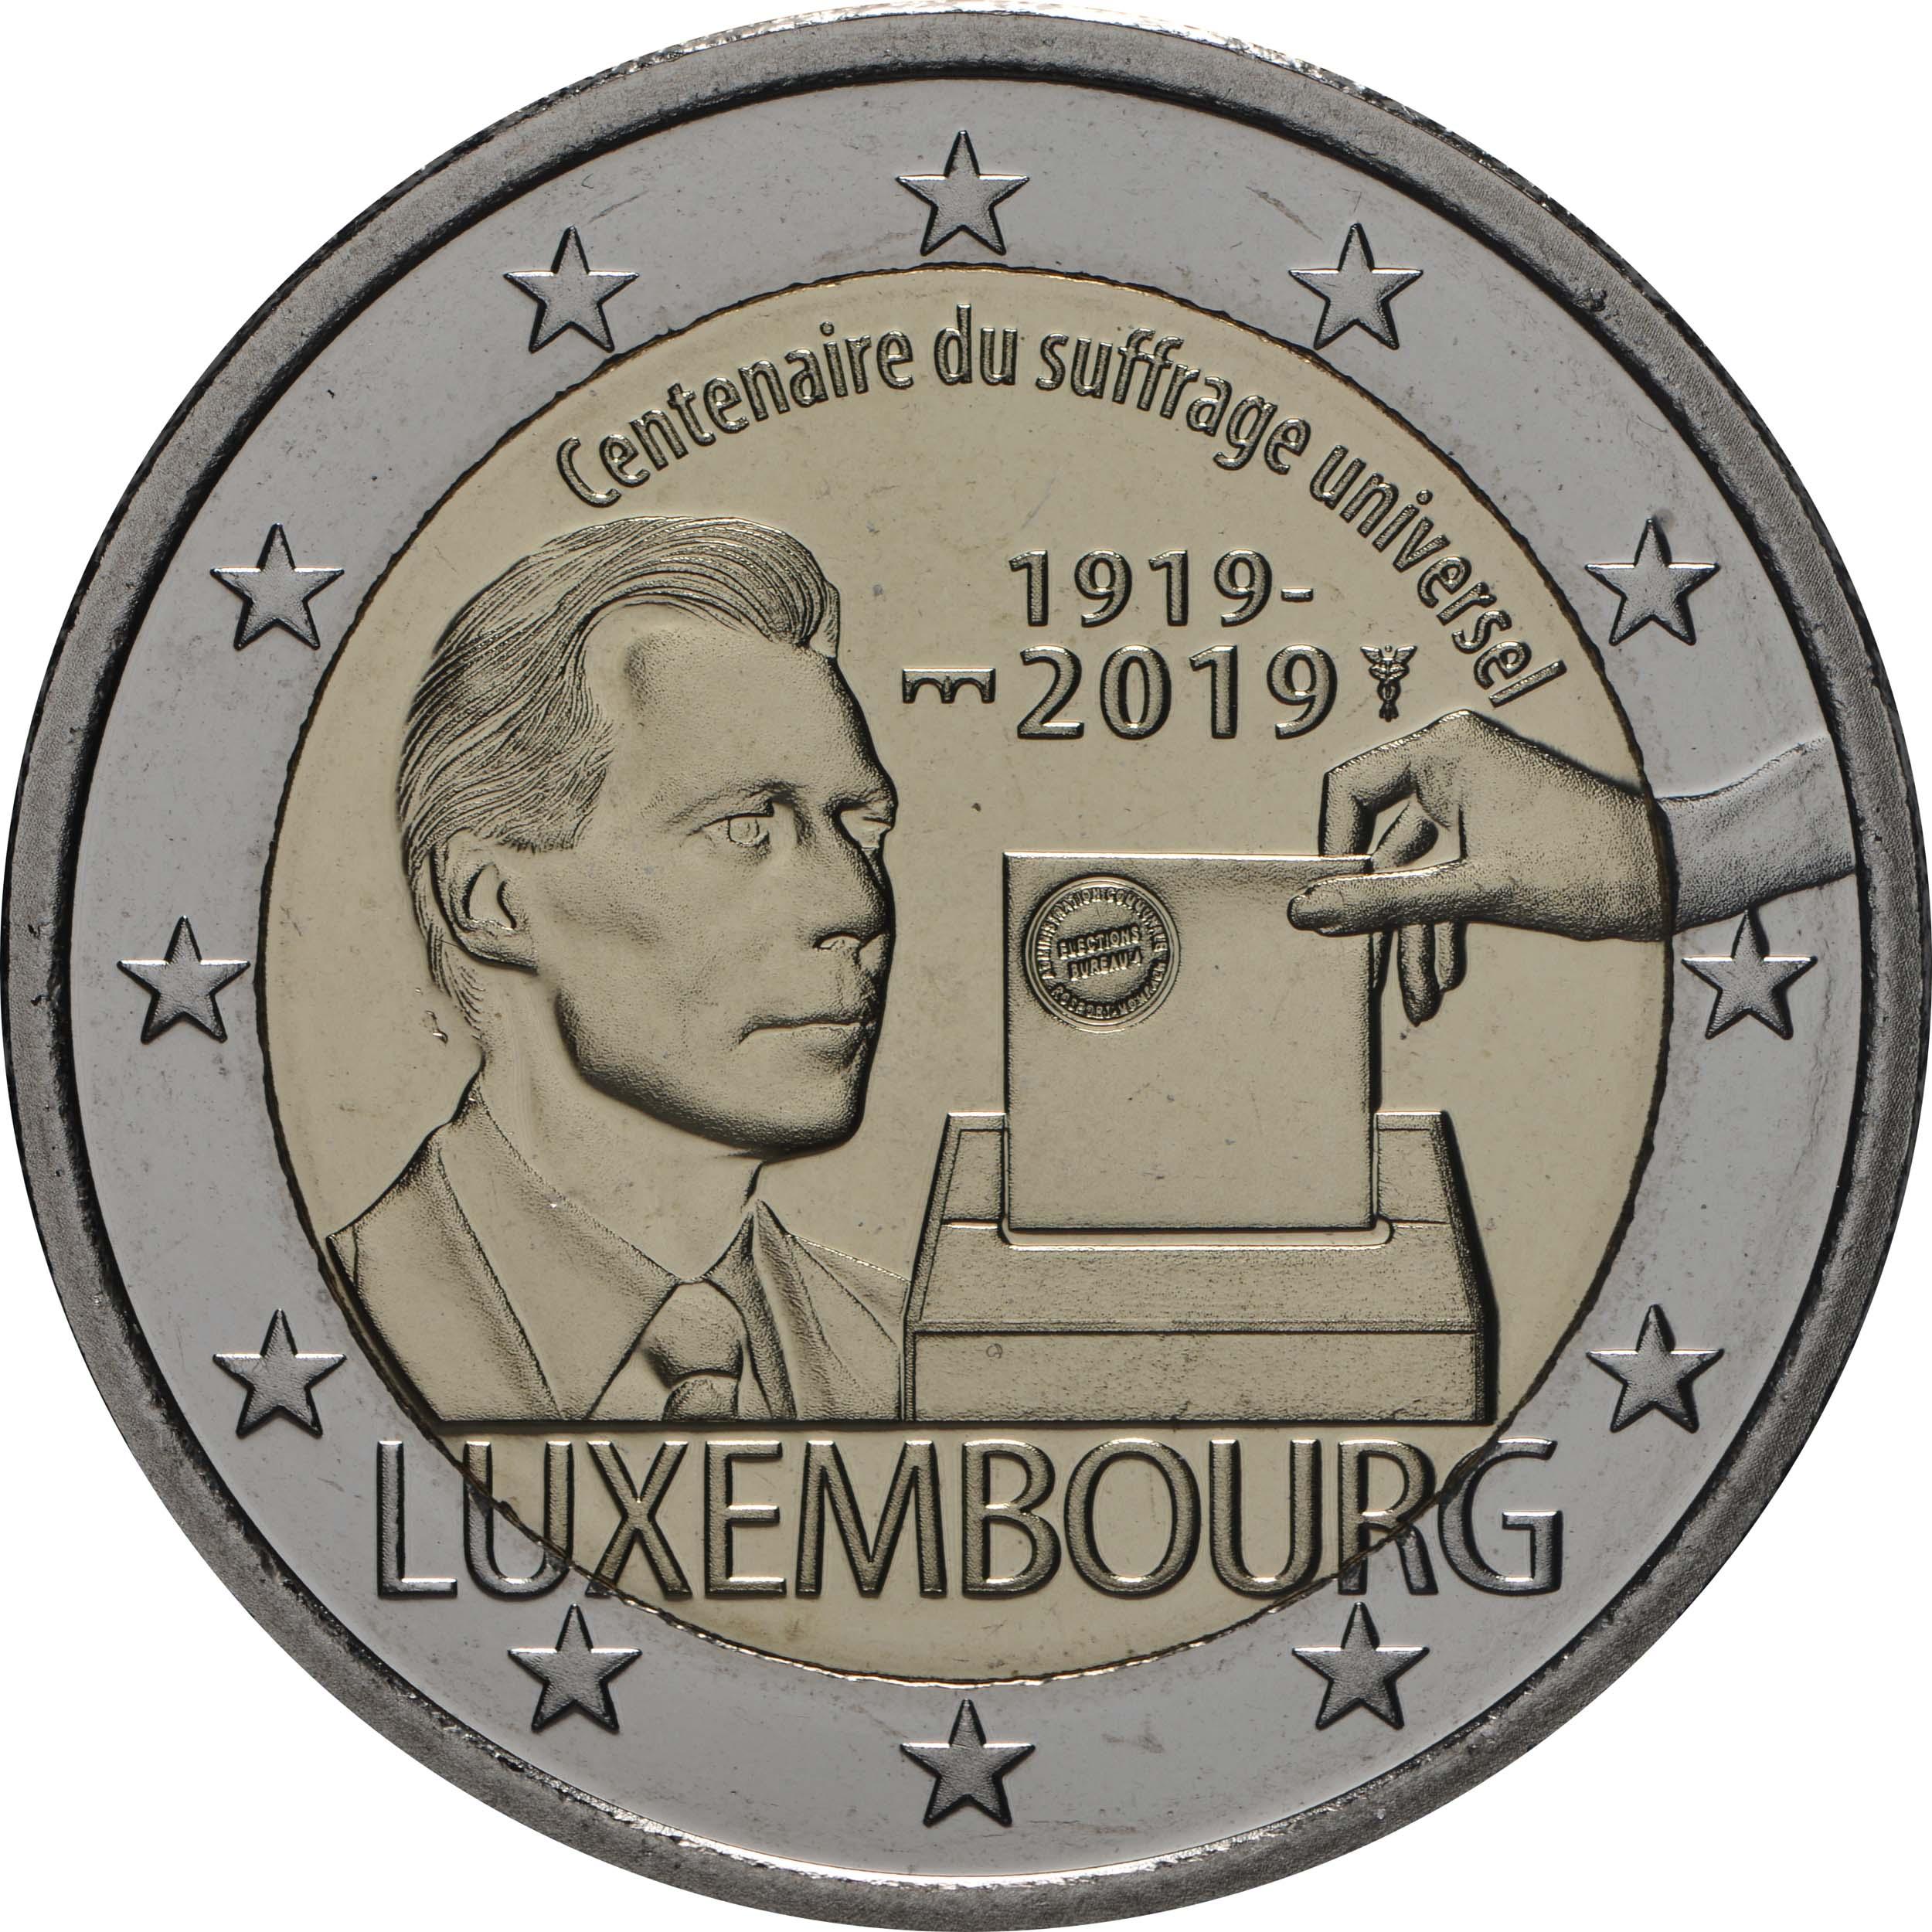 2019 355 Luxemburg Wahlrecht.jpg